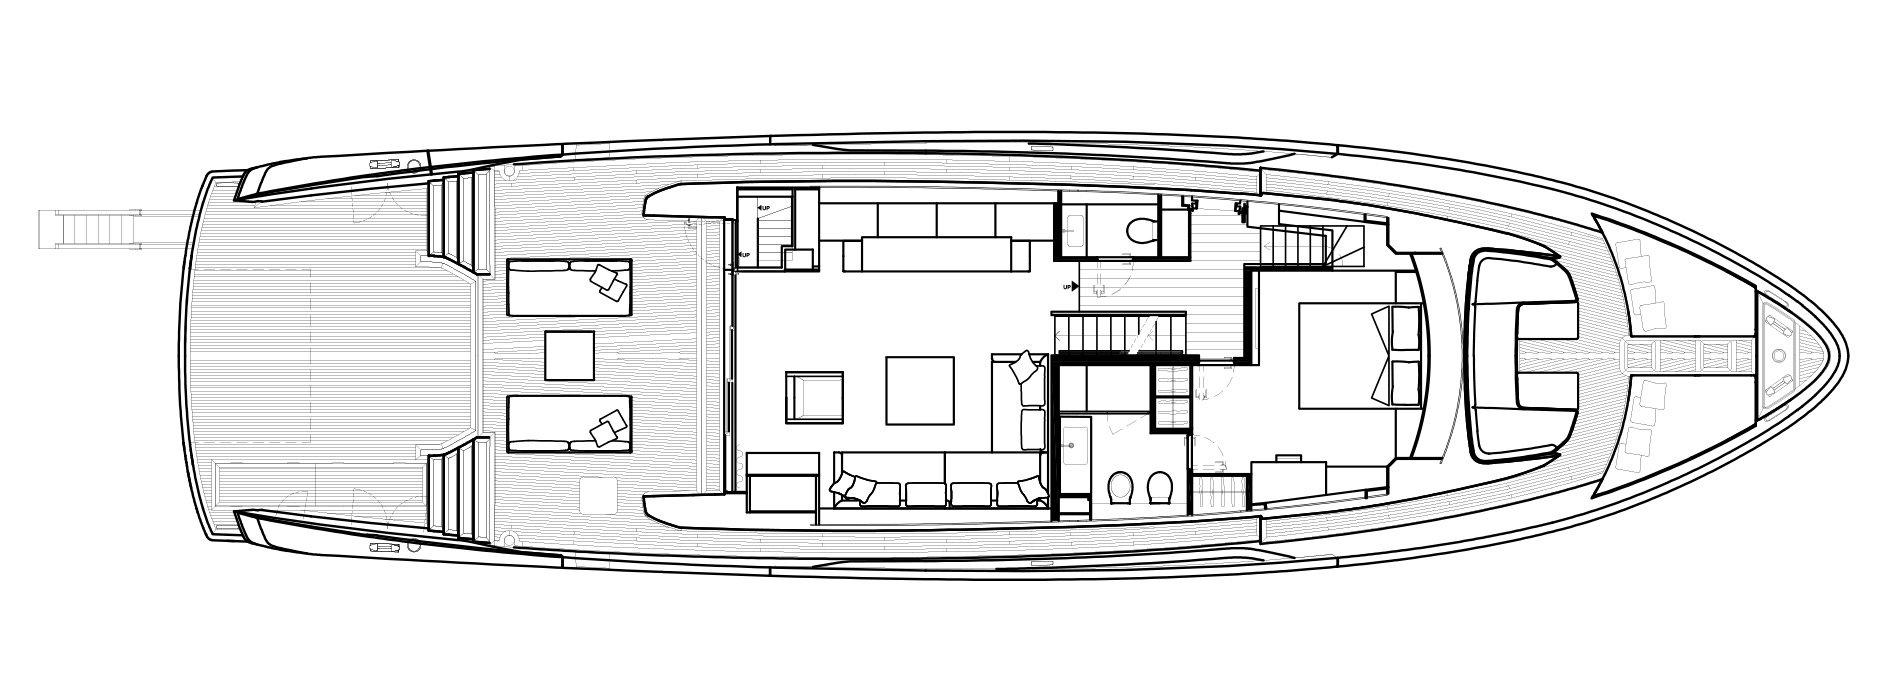 Sanlorenzo Yachts SX88 Hauptdeck Versione C